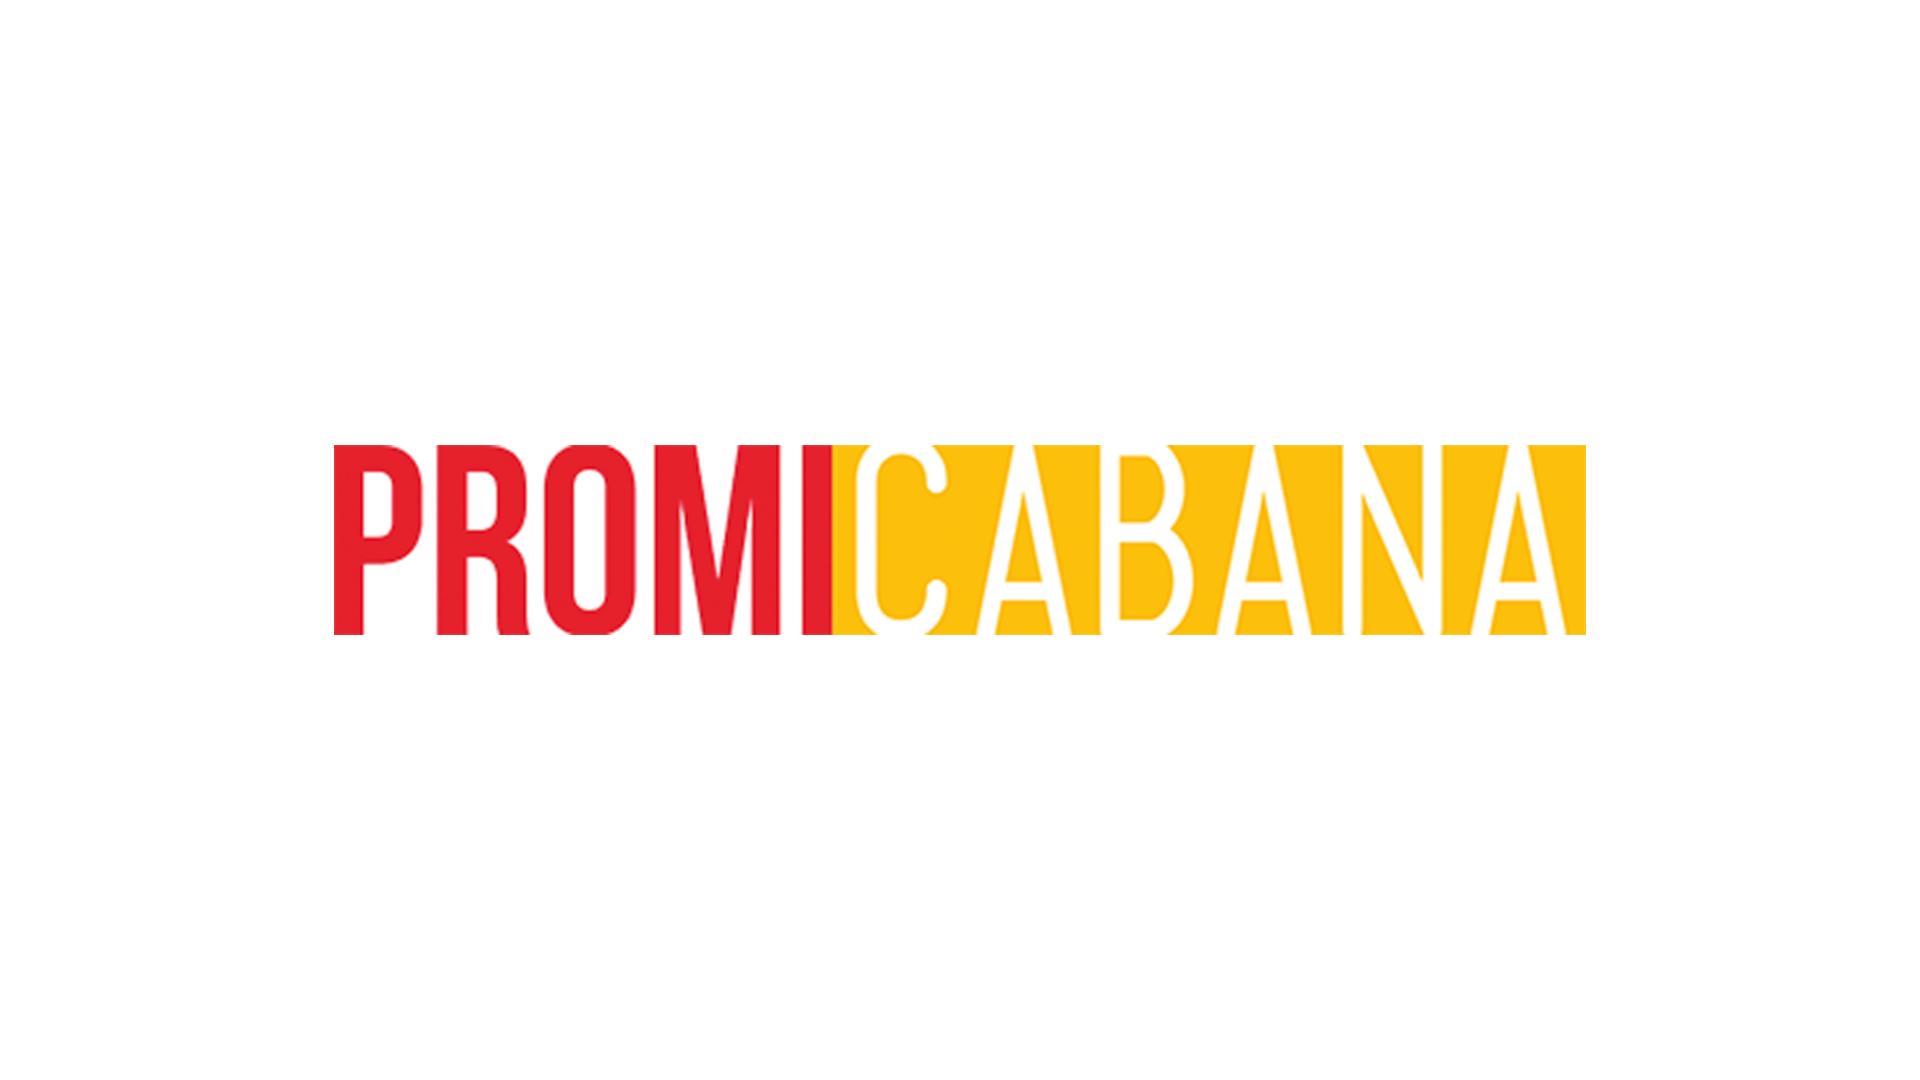 Trailer-Star-Trek-Iron-Man-Lone-Ranger-Oz